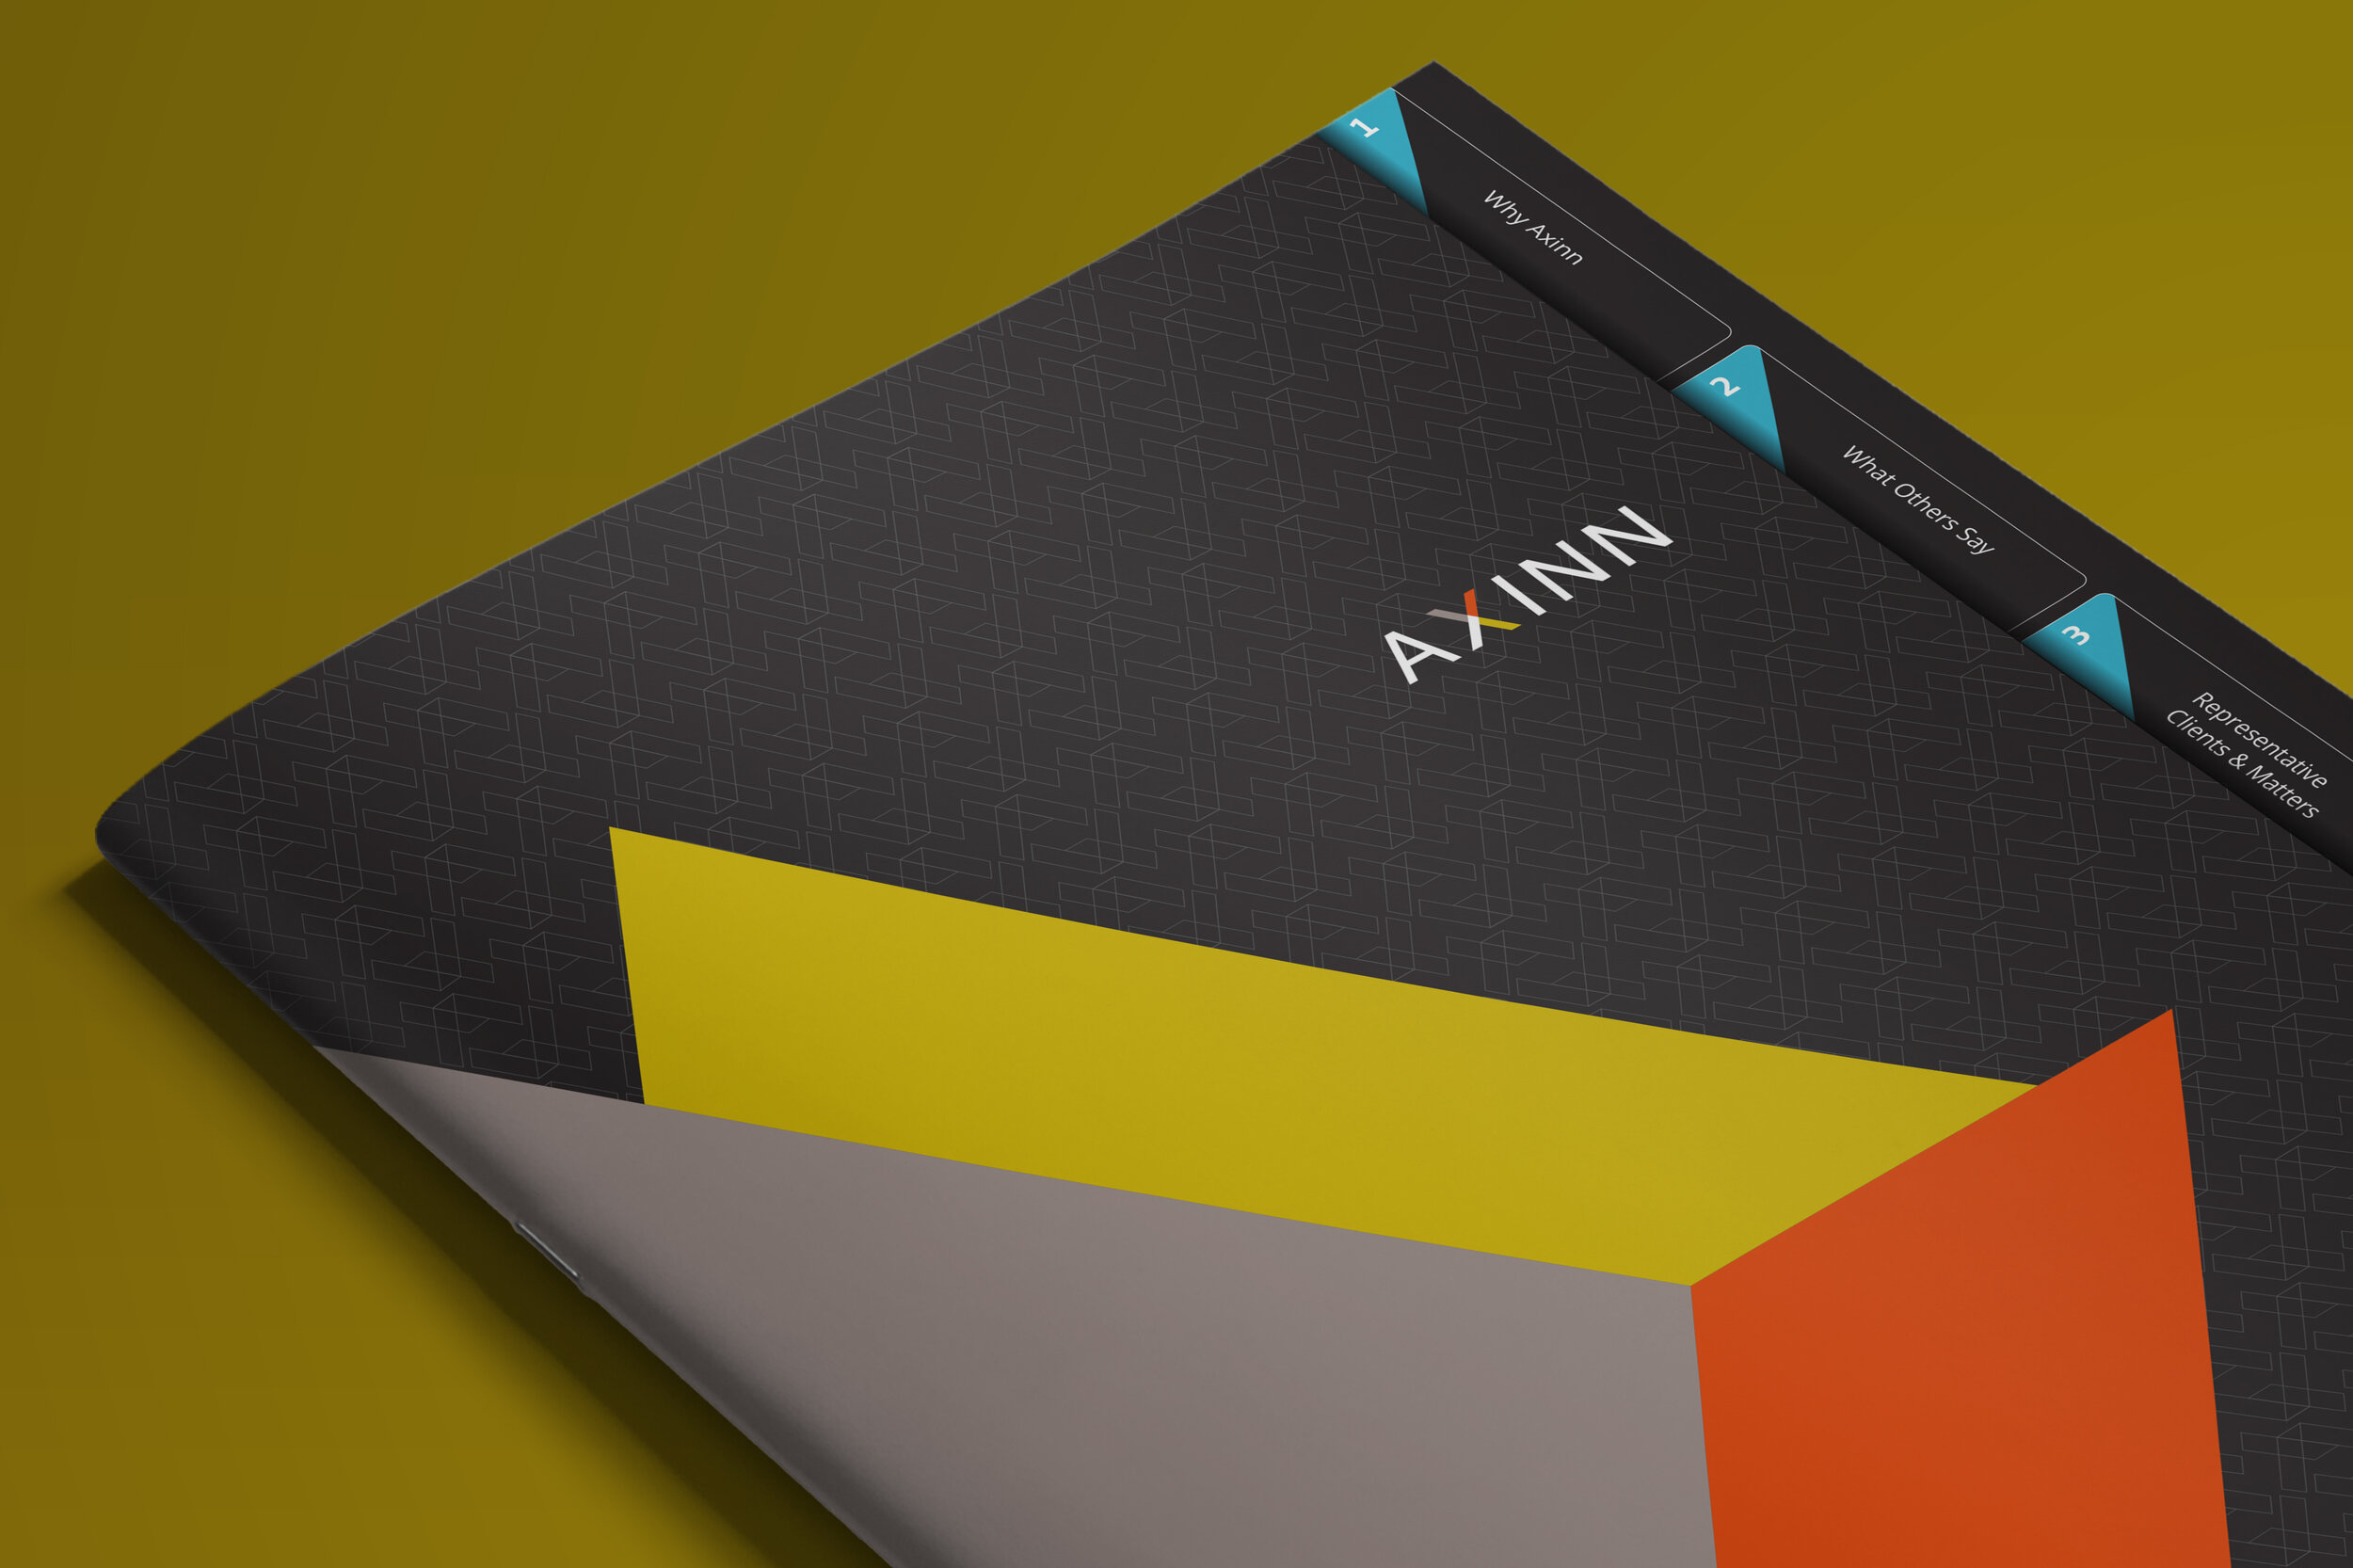 axinn front cover larger_2019.jpg